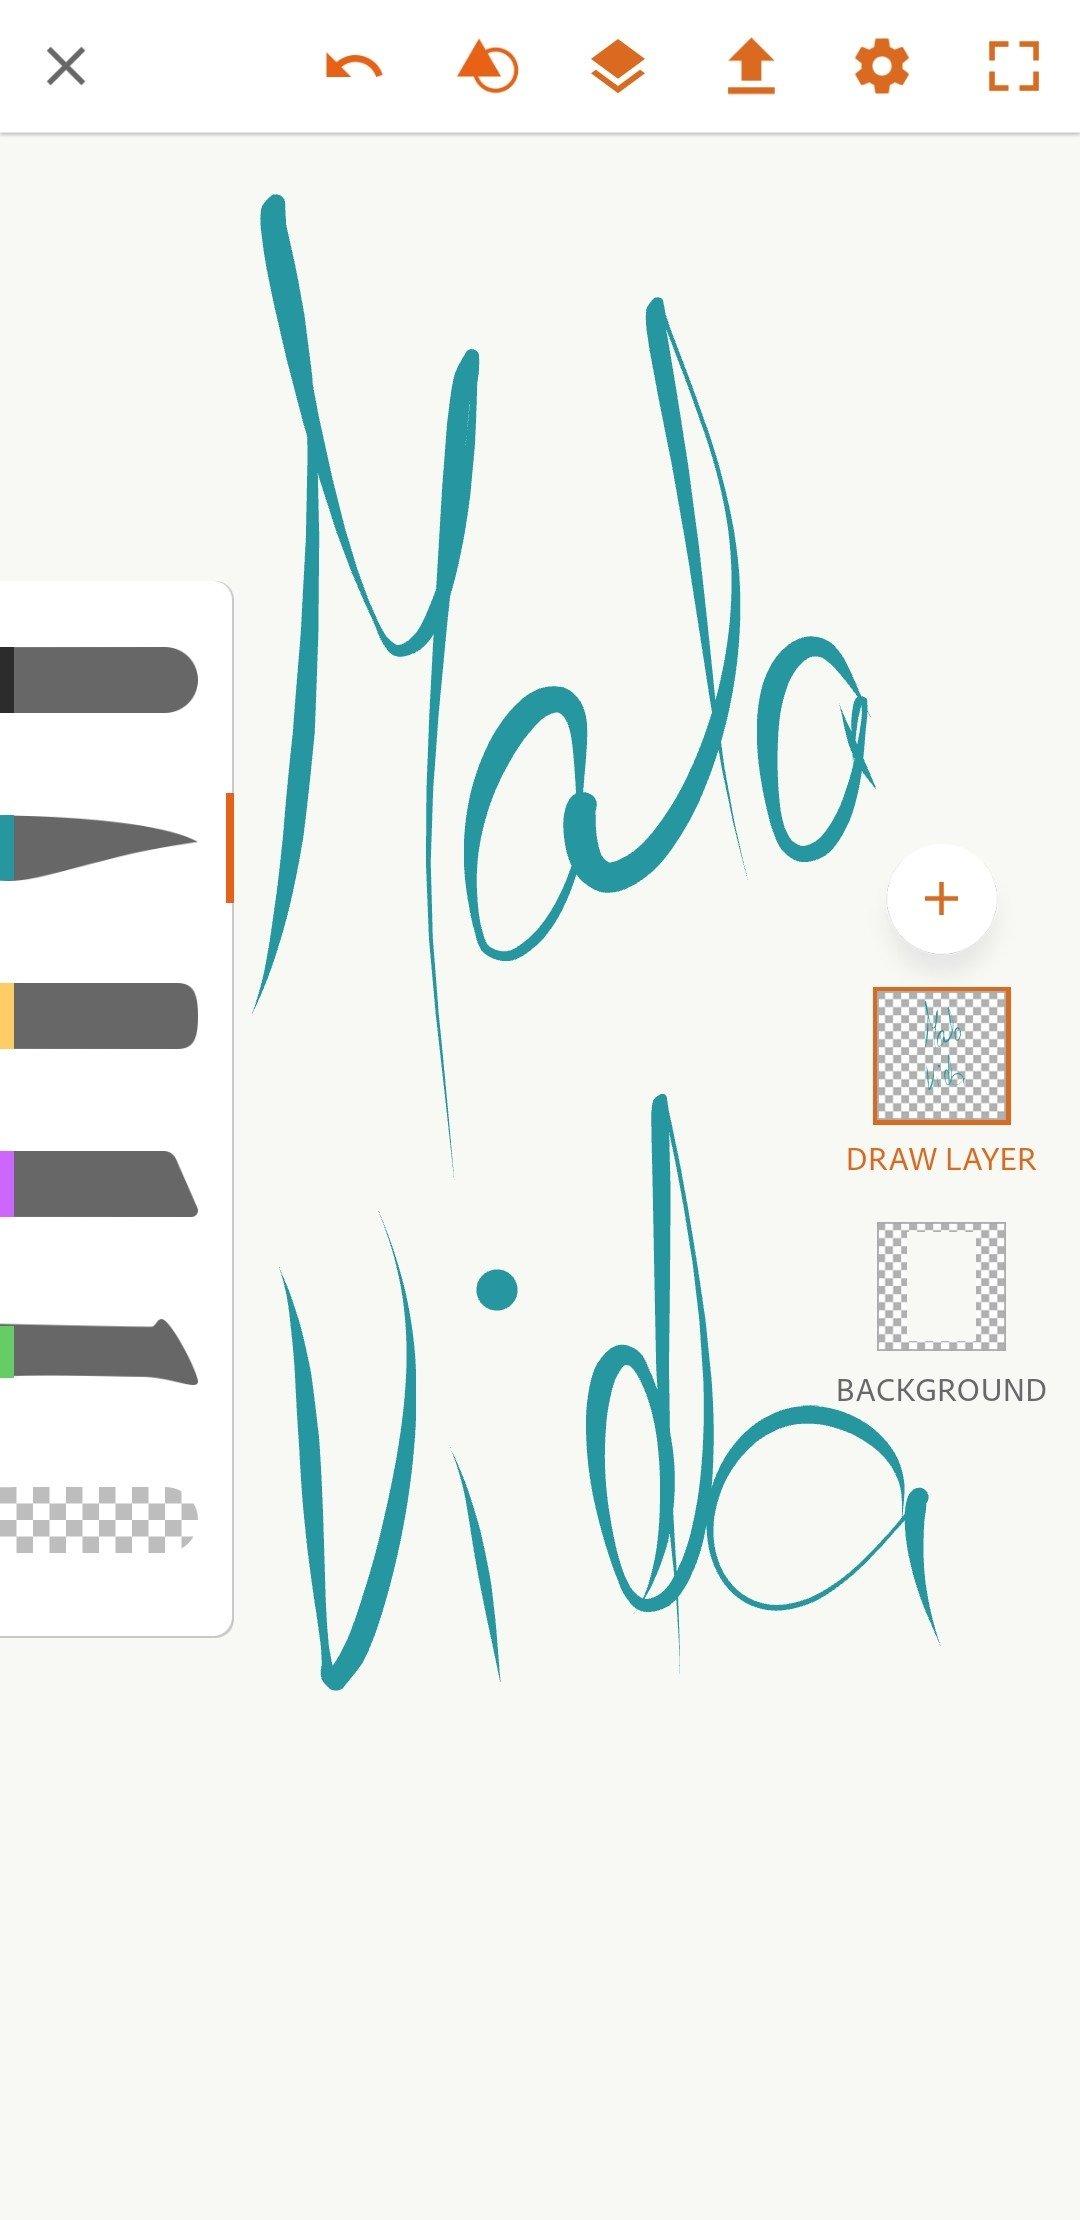 Adobe Illustrator Draw Android image 5